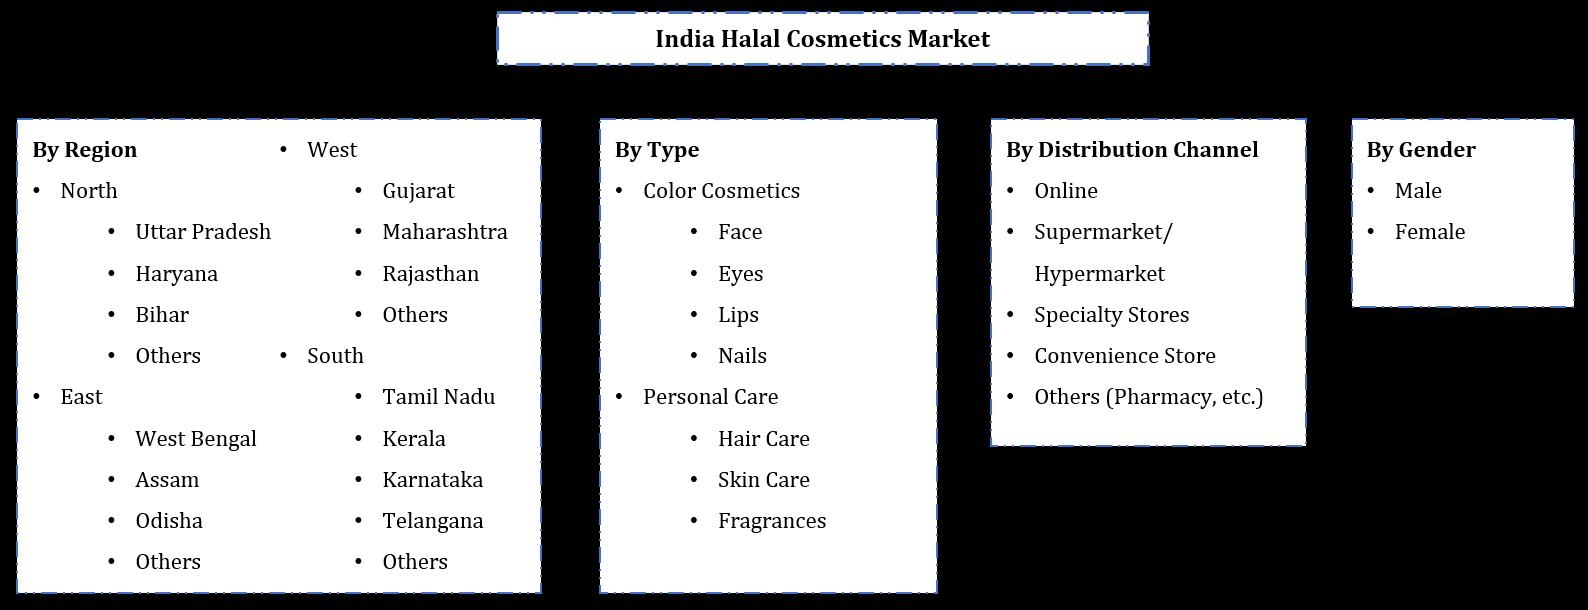 India Halal Cosmetics Market Segmentation